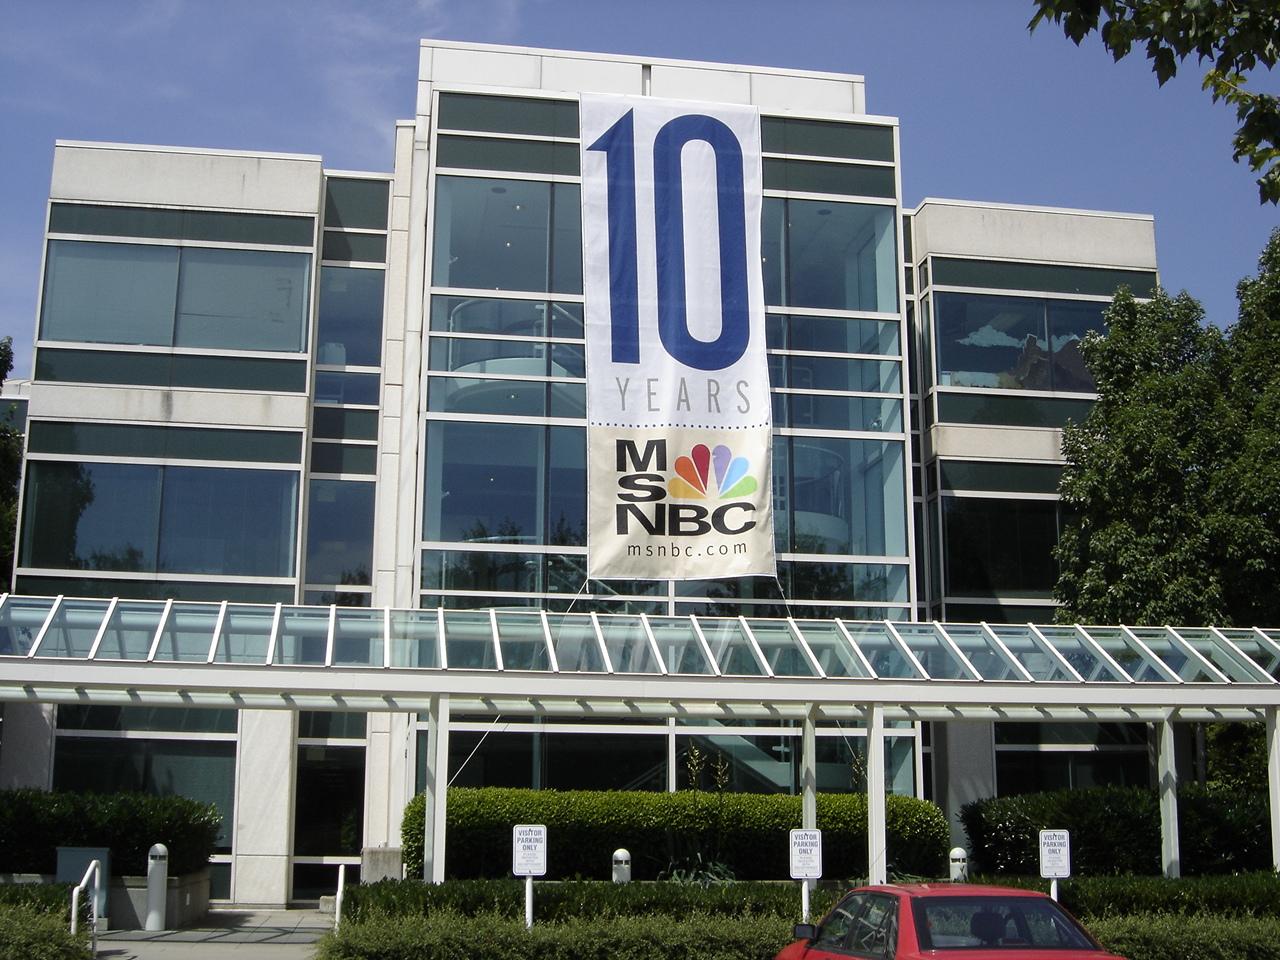 Microsoft MSNBC.com'daki hisselerini Comcast'a devretti